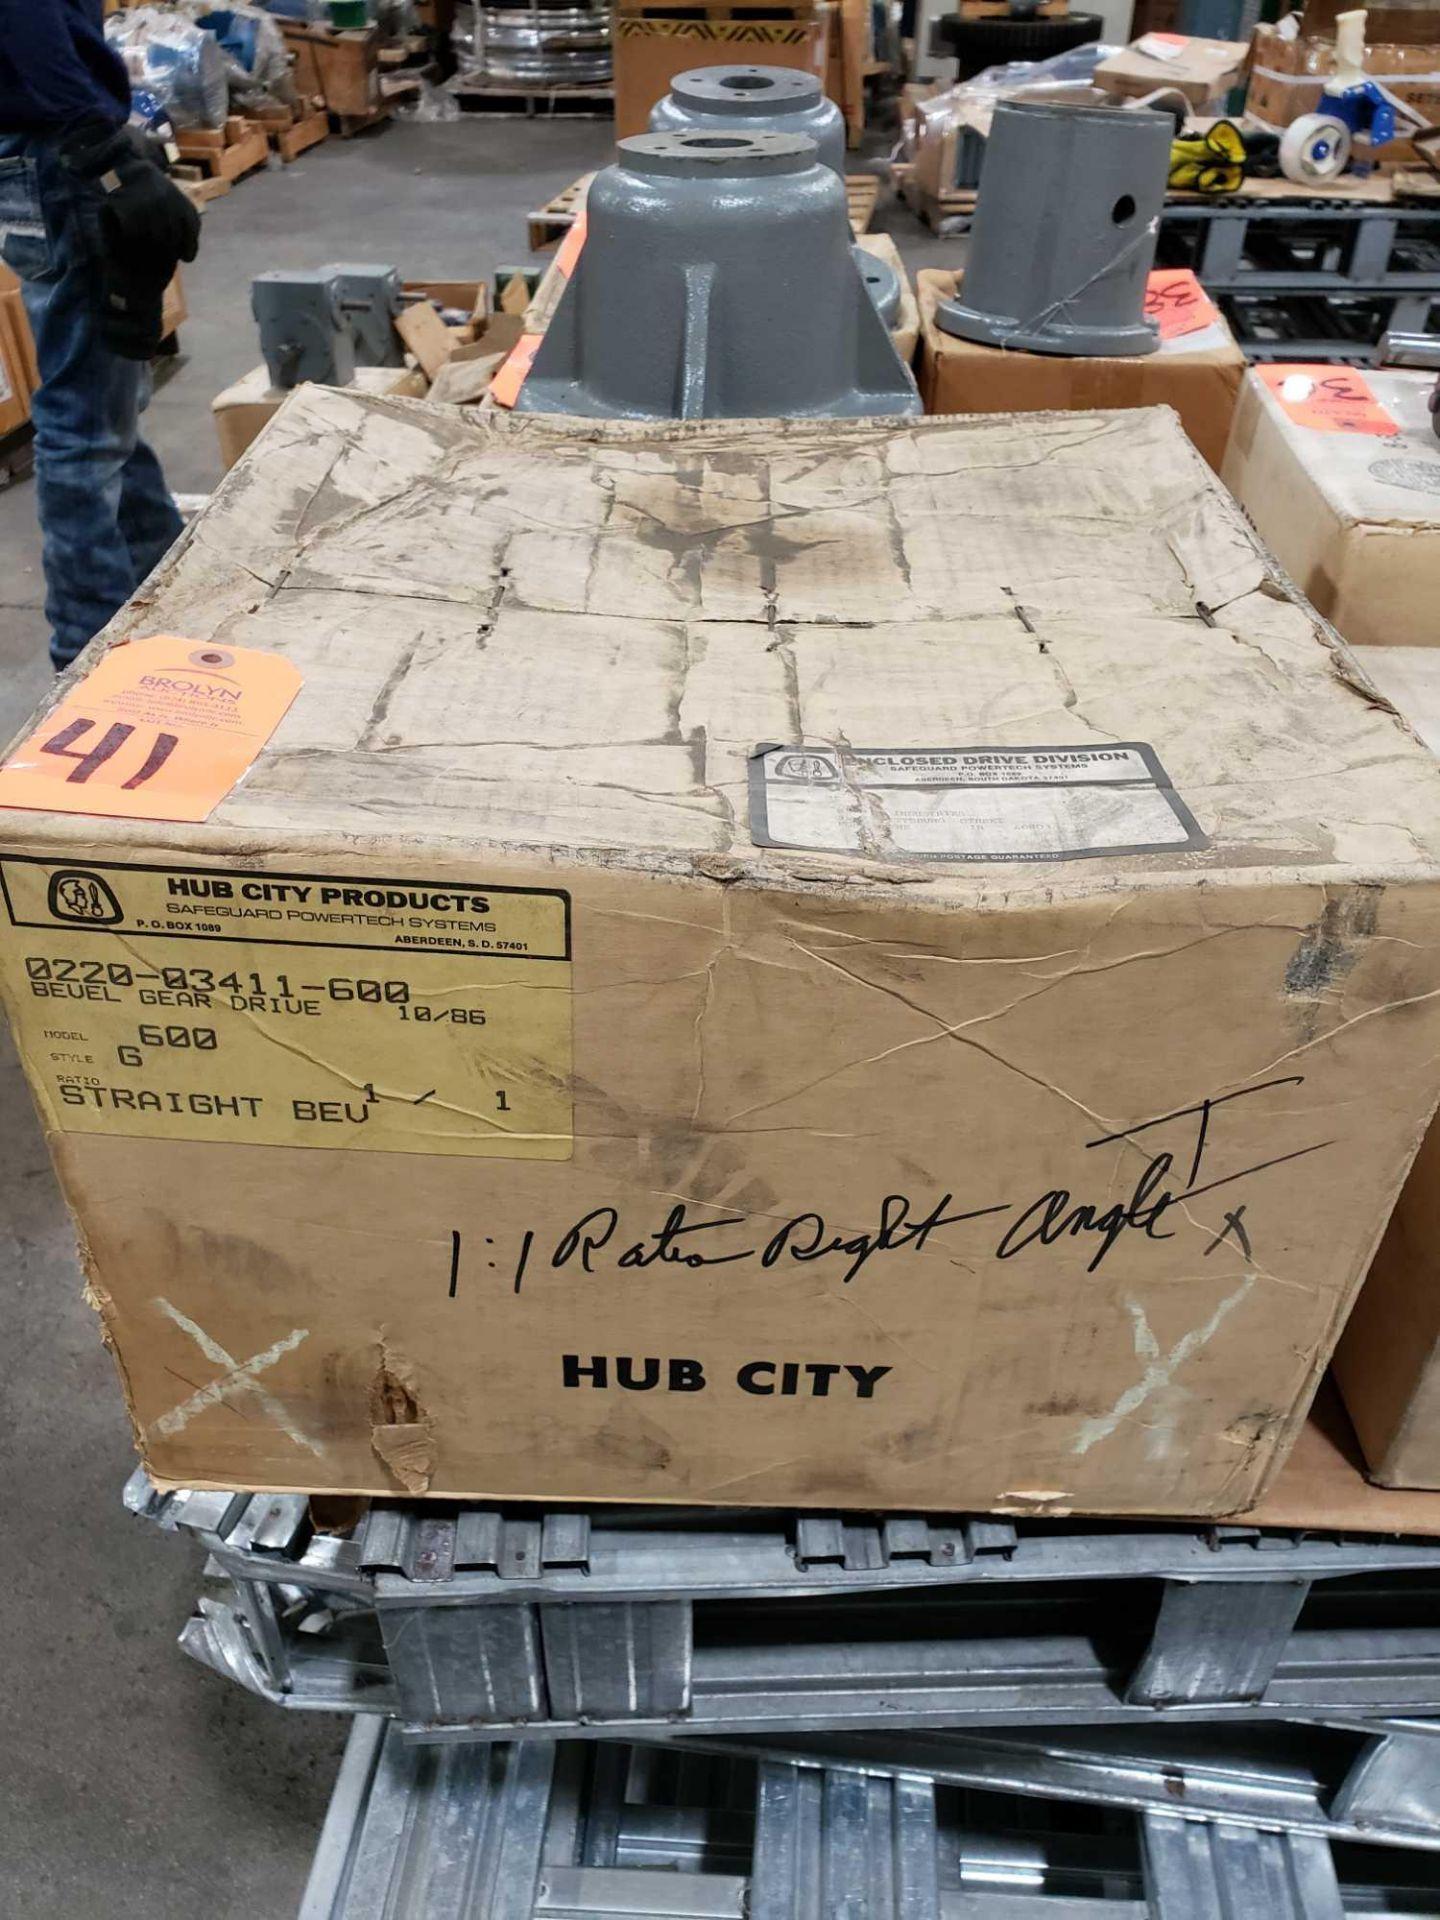 Lot 41 - Hub City model 0220-03411-600 bevel gear drive. Model 600 style G. 1:1 ratio.